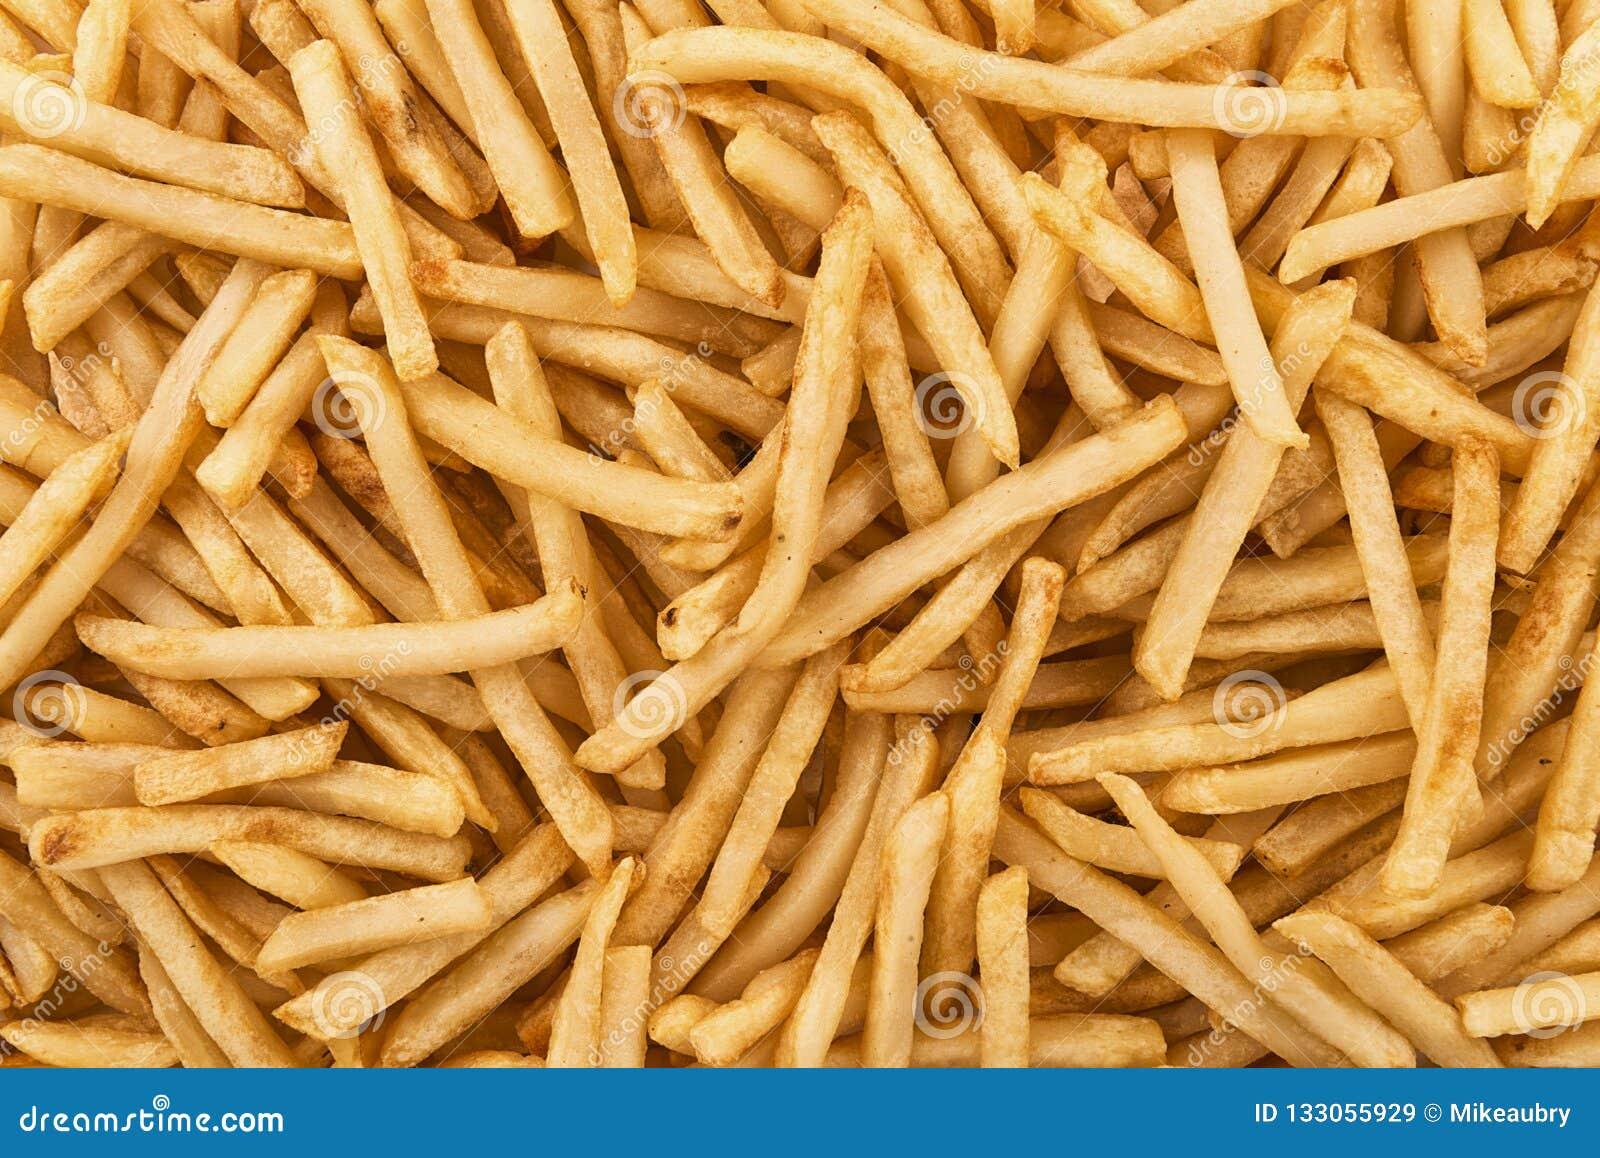 Fondo de la pila de patatas fritas curruscantes, directamente arriba